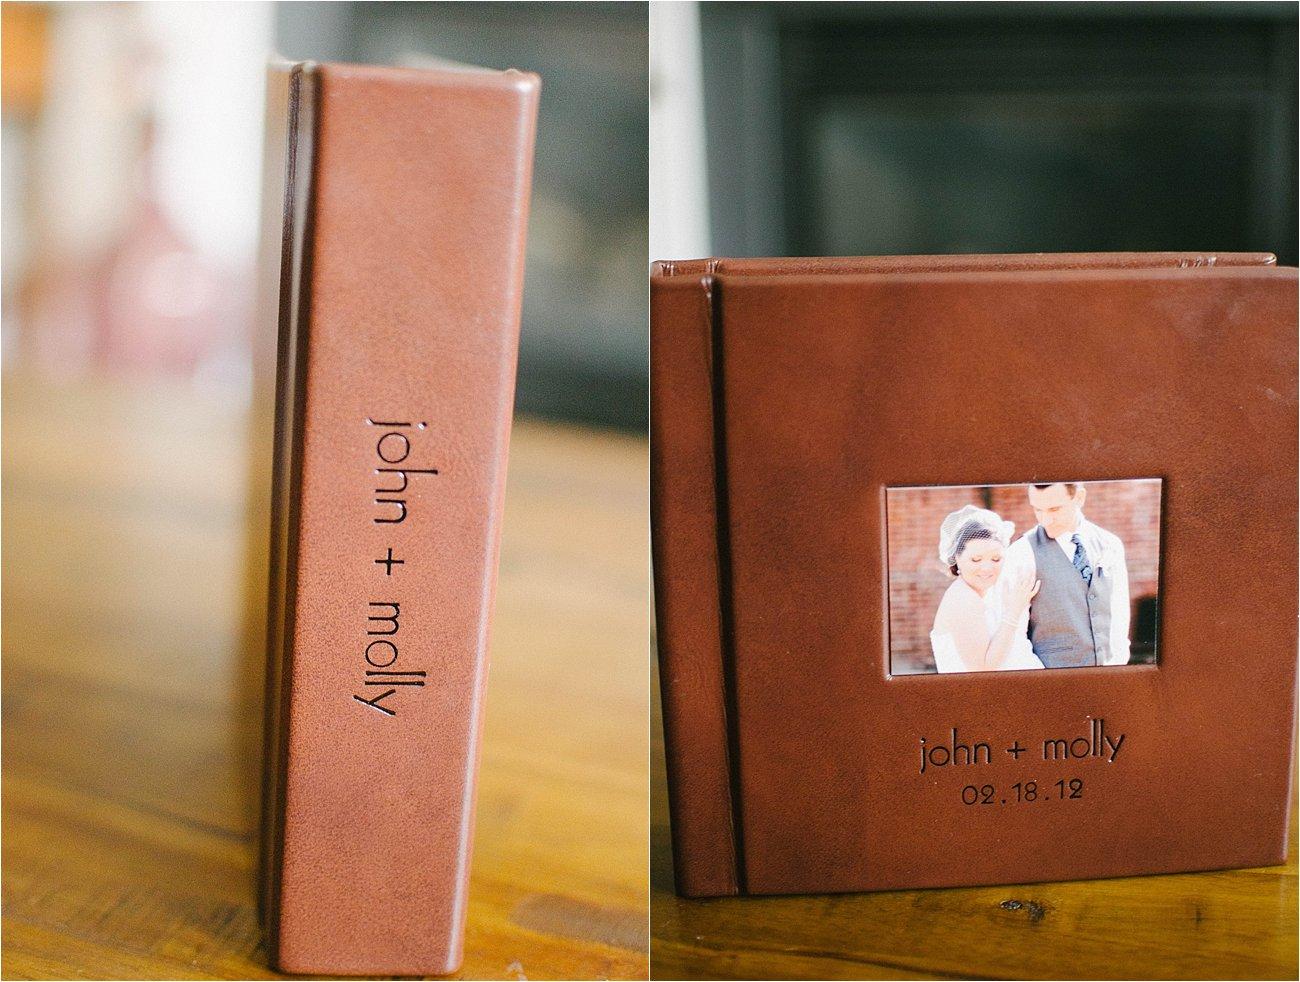 Leather Craftsman Wedding Album 8x8 Review (2)